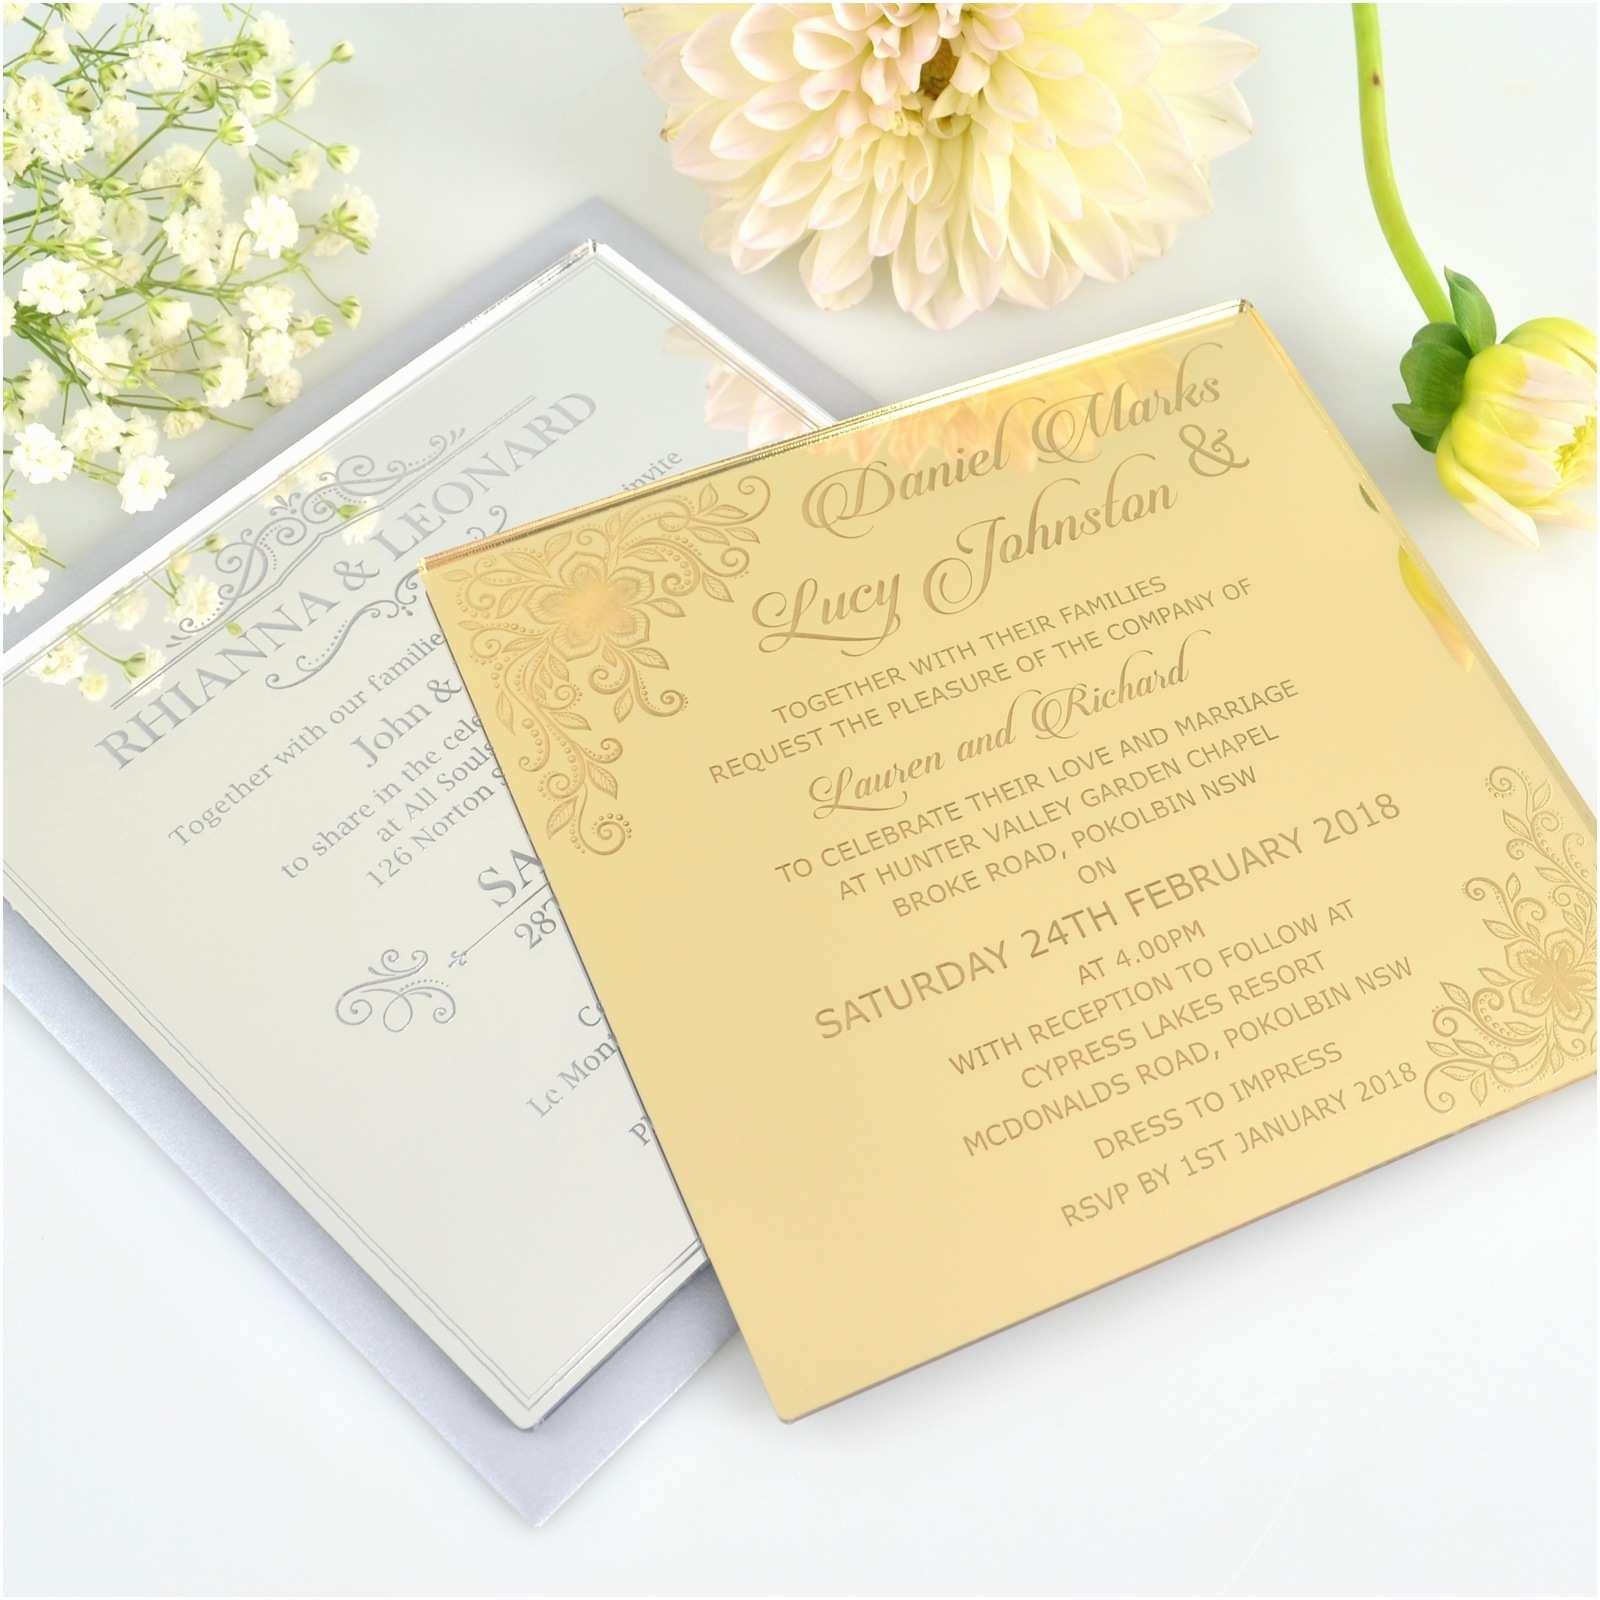 Engraved Wedding Invitations Engraved Square Mirror Acrylic Wedding Invitations